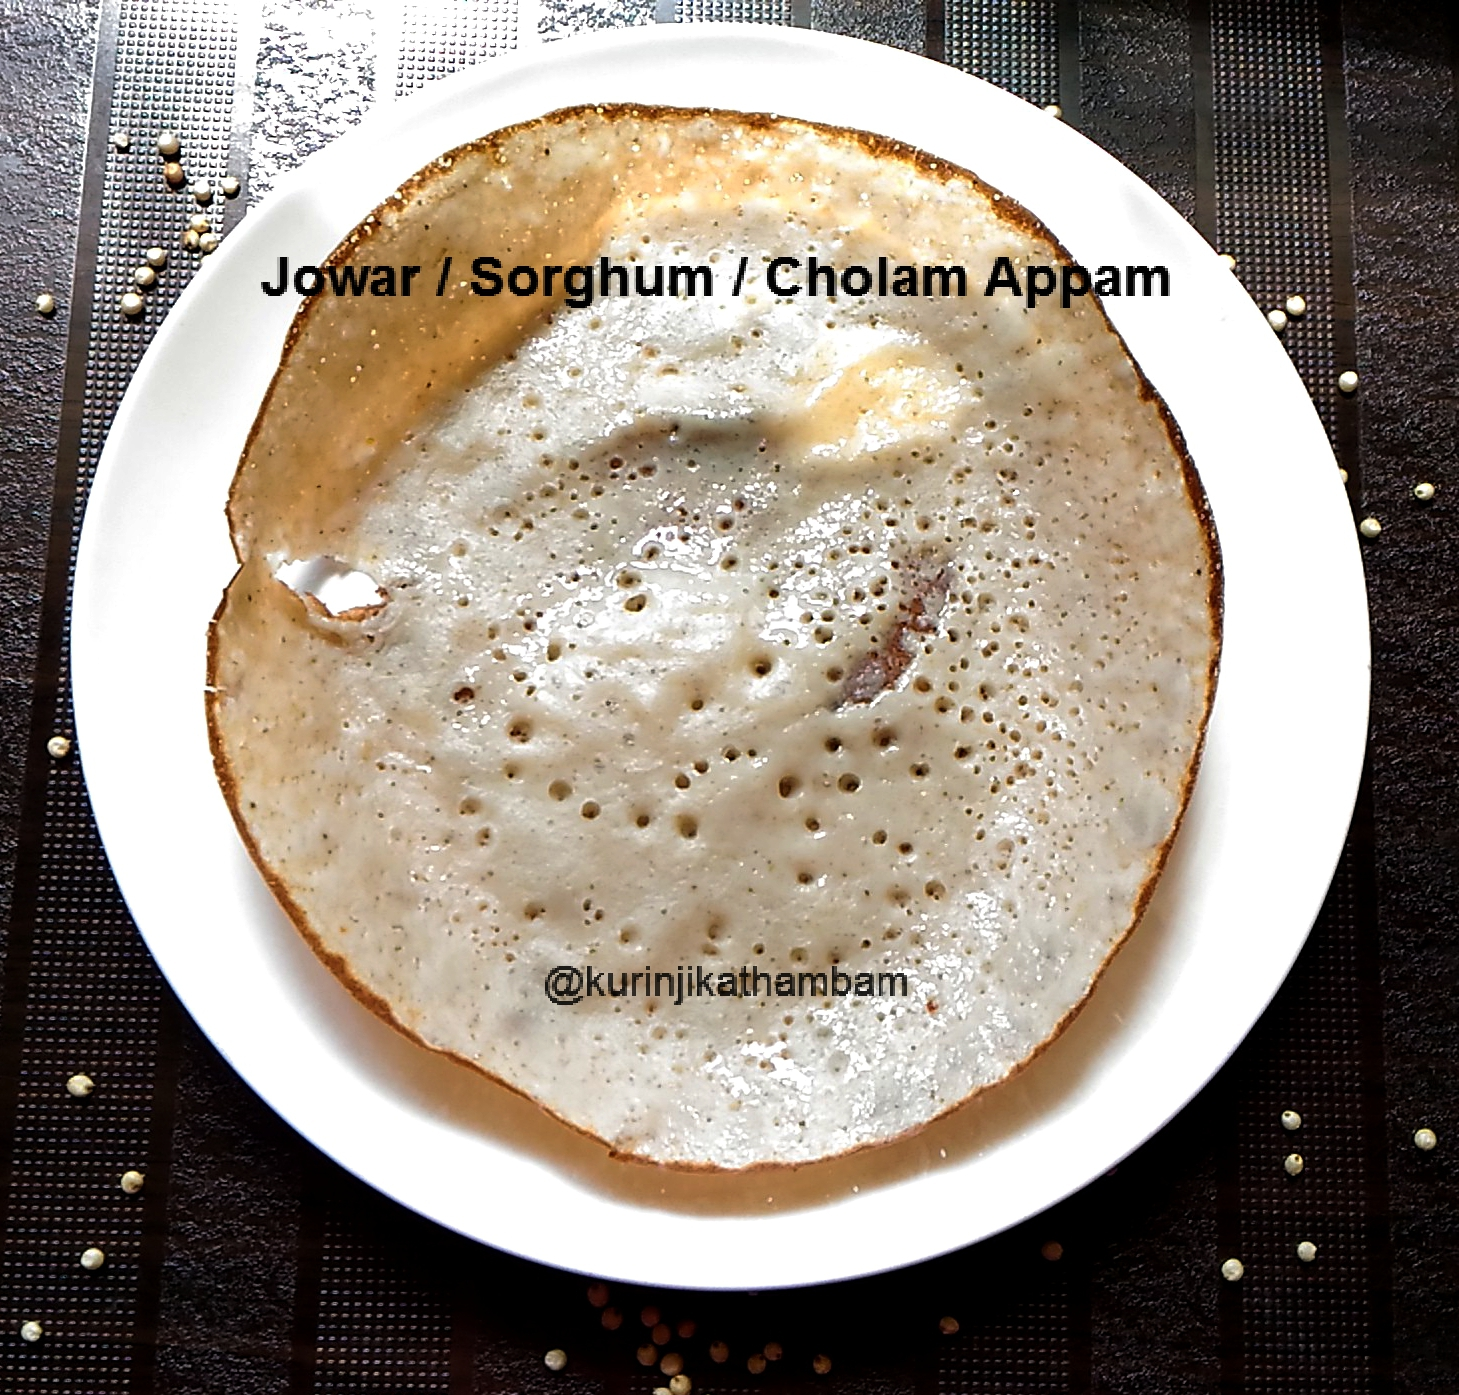 Jowar Aappam / Sorghum Appam / White Cholam Aapam | Jowar Recipes ...